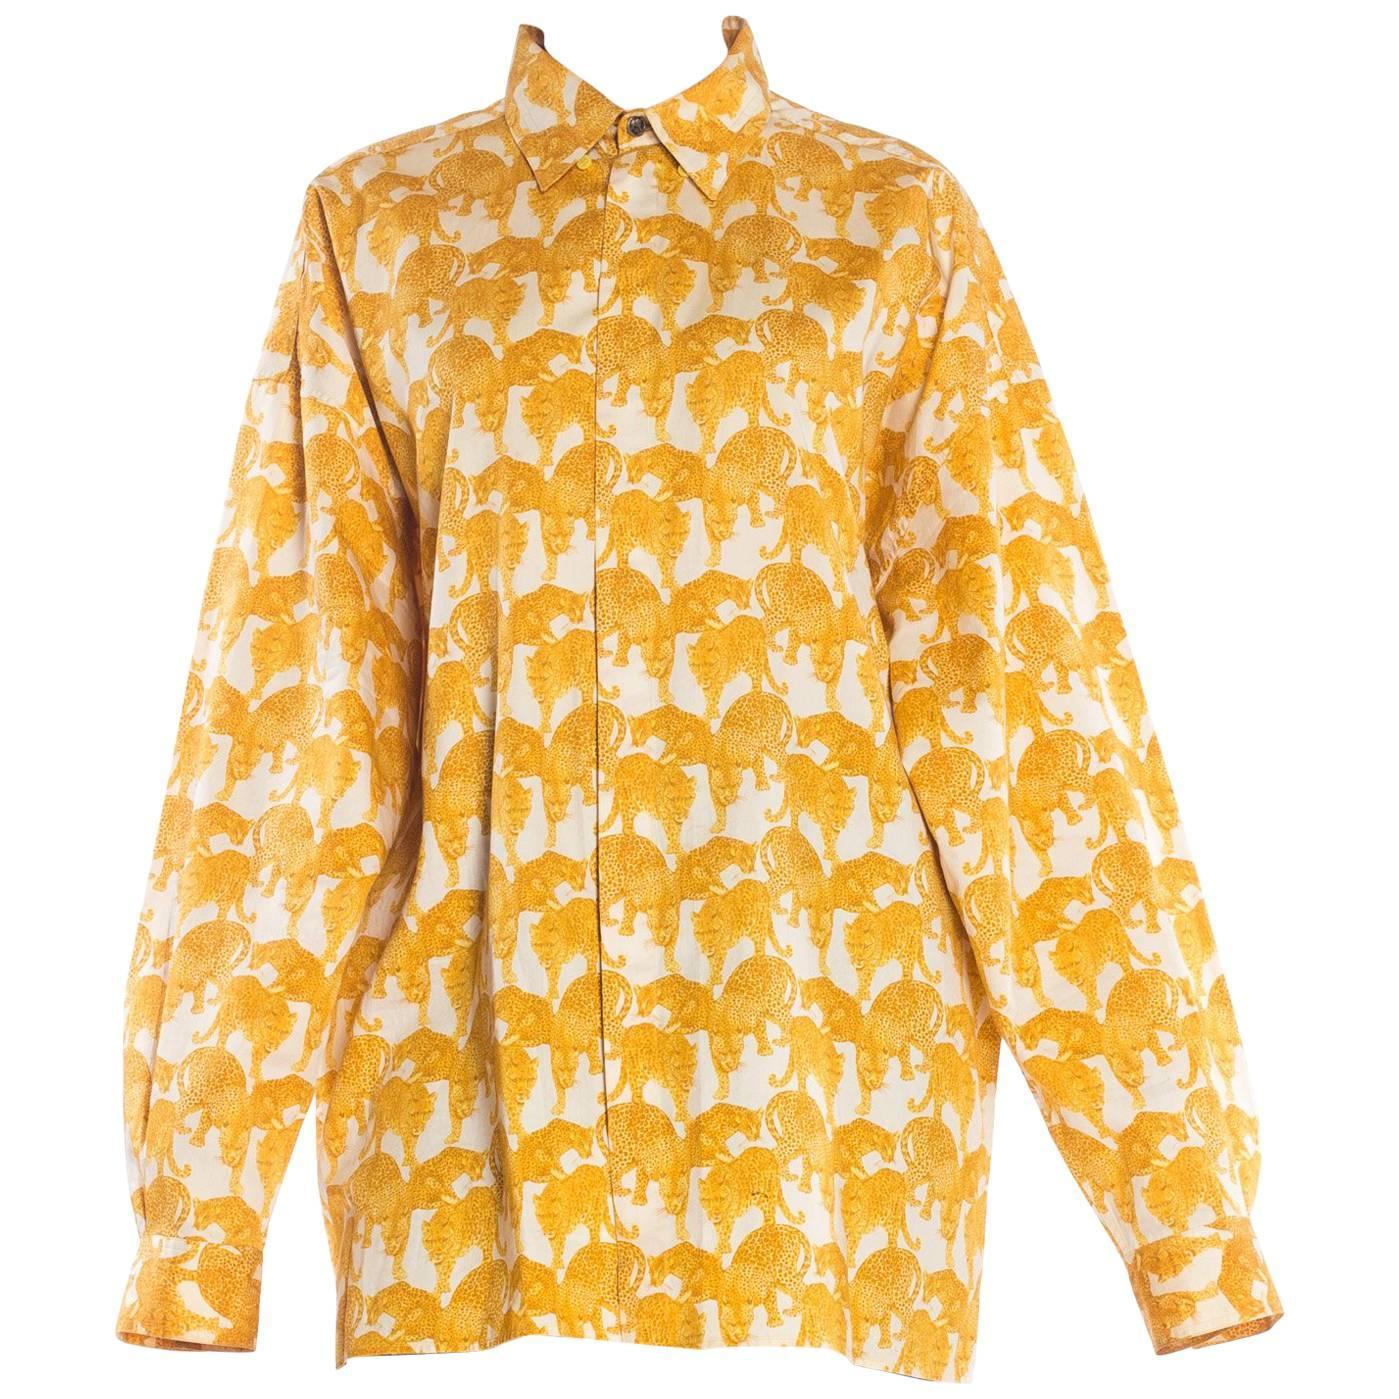 106fcda42 Gianni Versace Couture Barocco Crucifix Silk Print Mens Shirt For Sale at  1stdibs